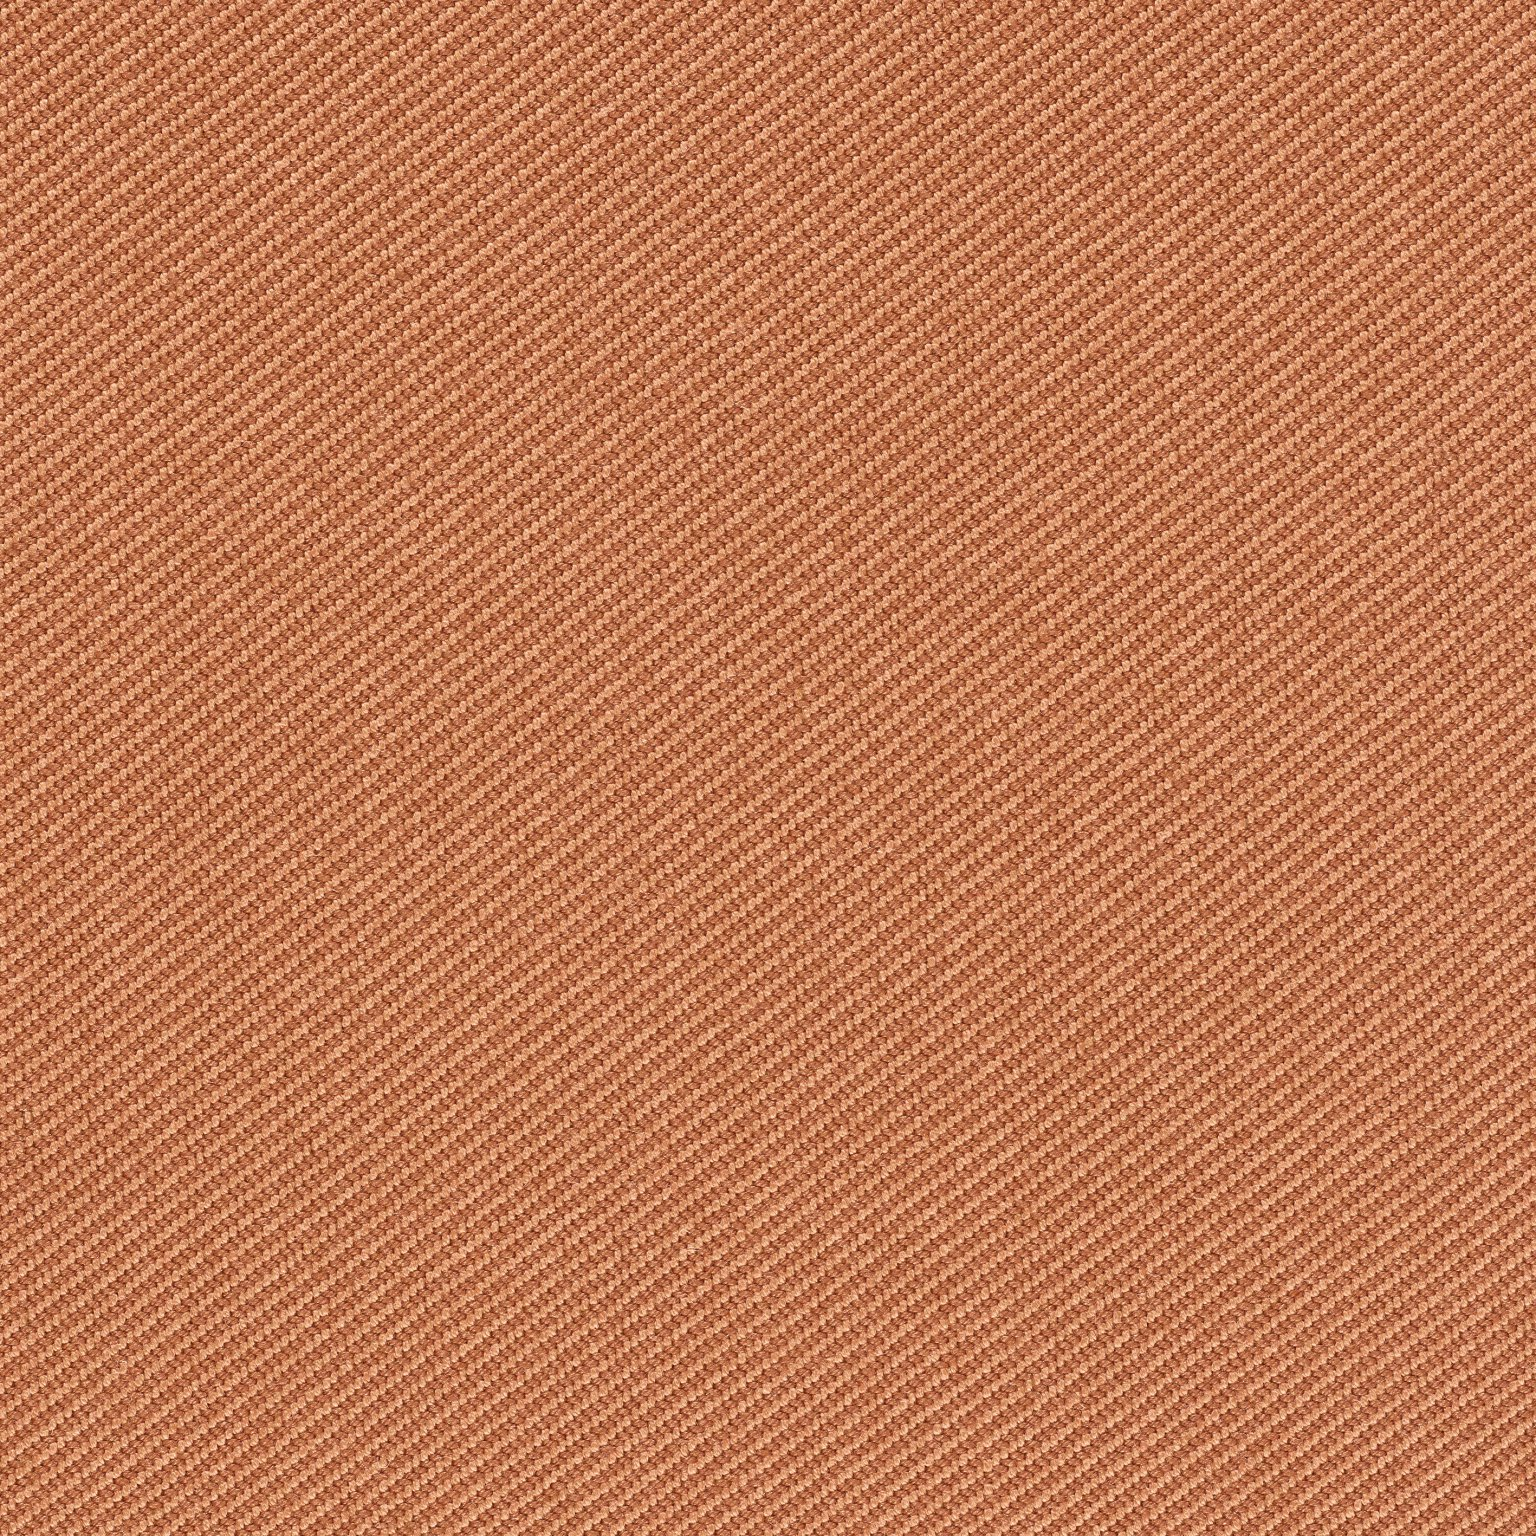 Kvadrat > Twill Weave 0550